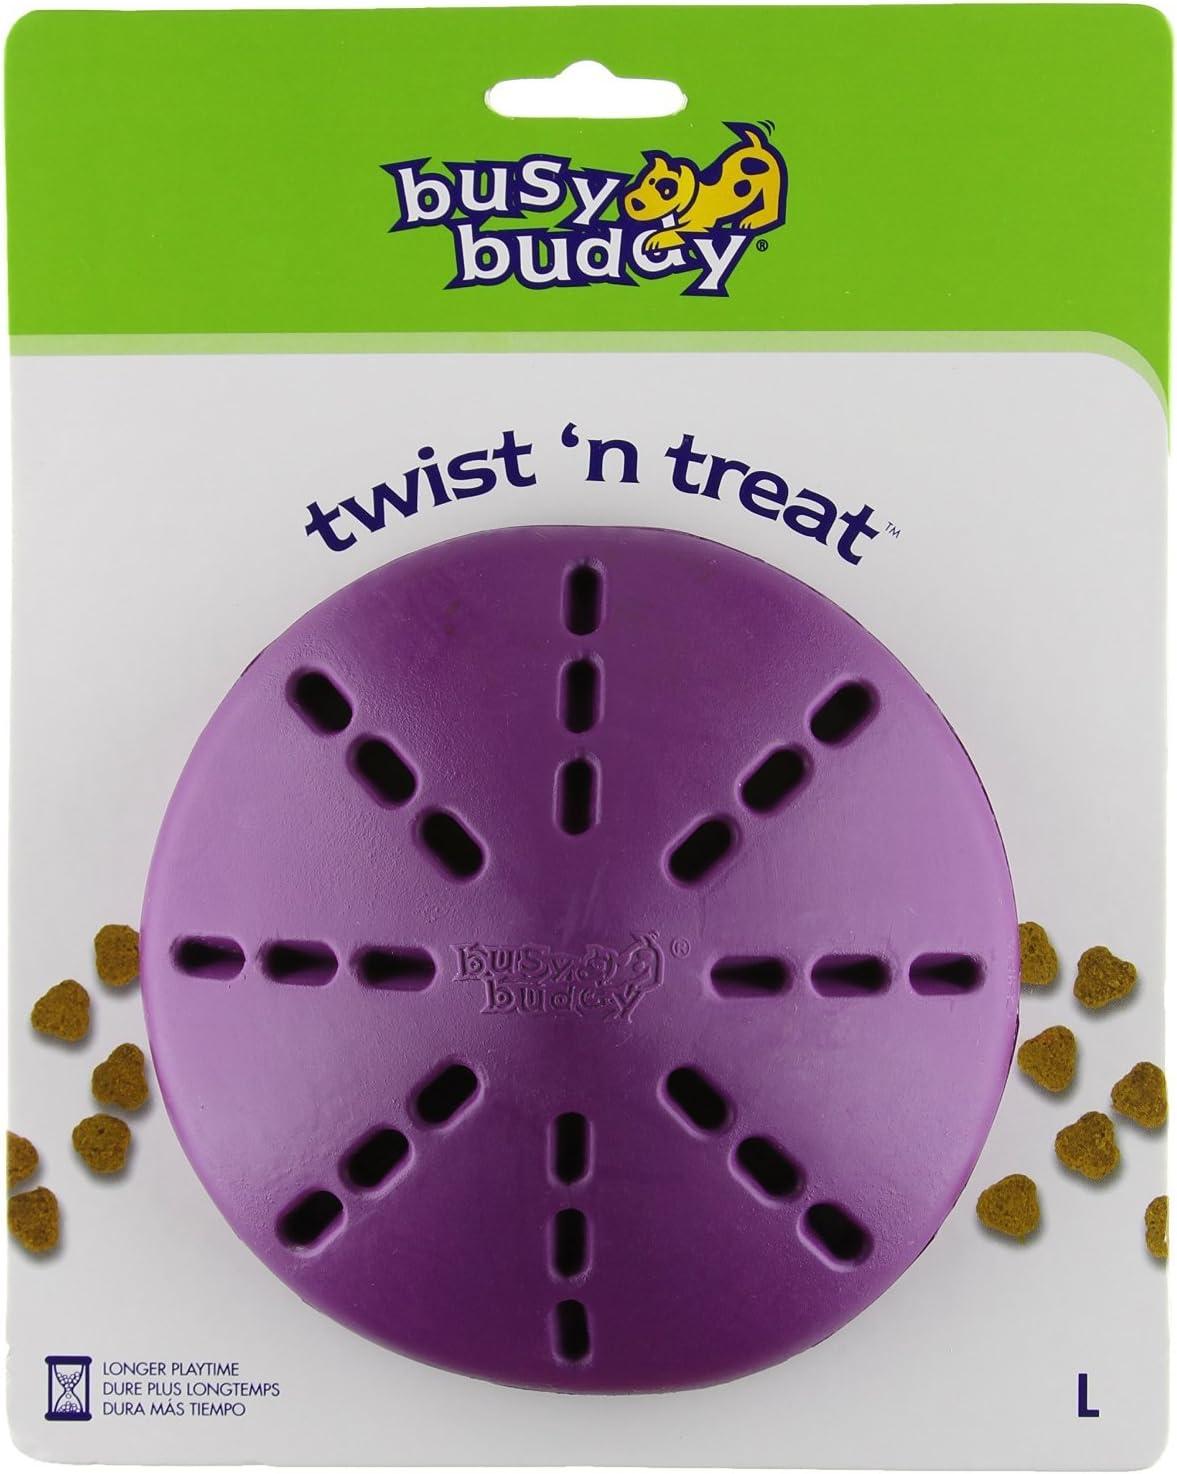 Juguete dispensador Busy Buddy Twist 'n Treat.